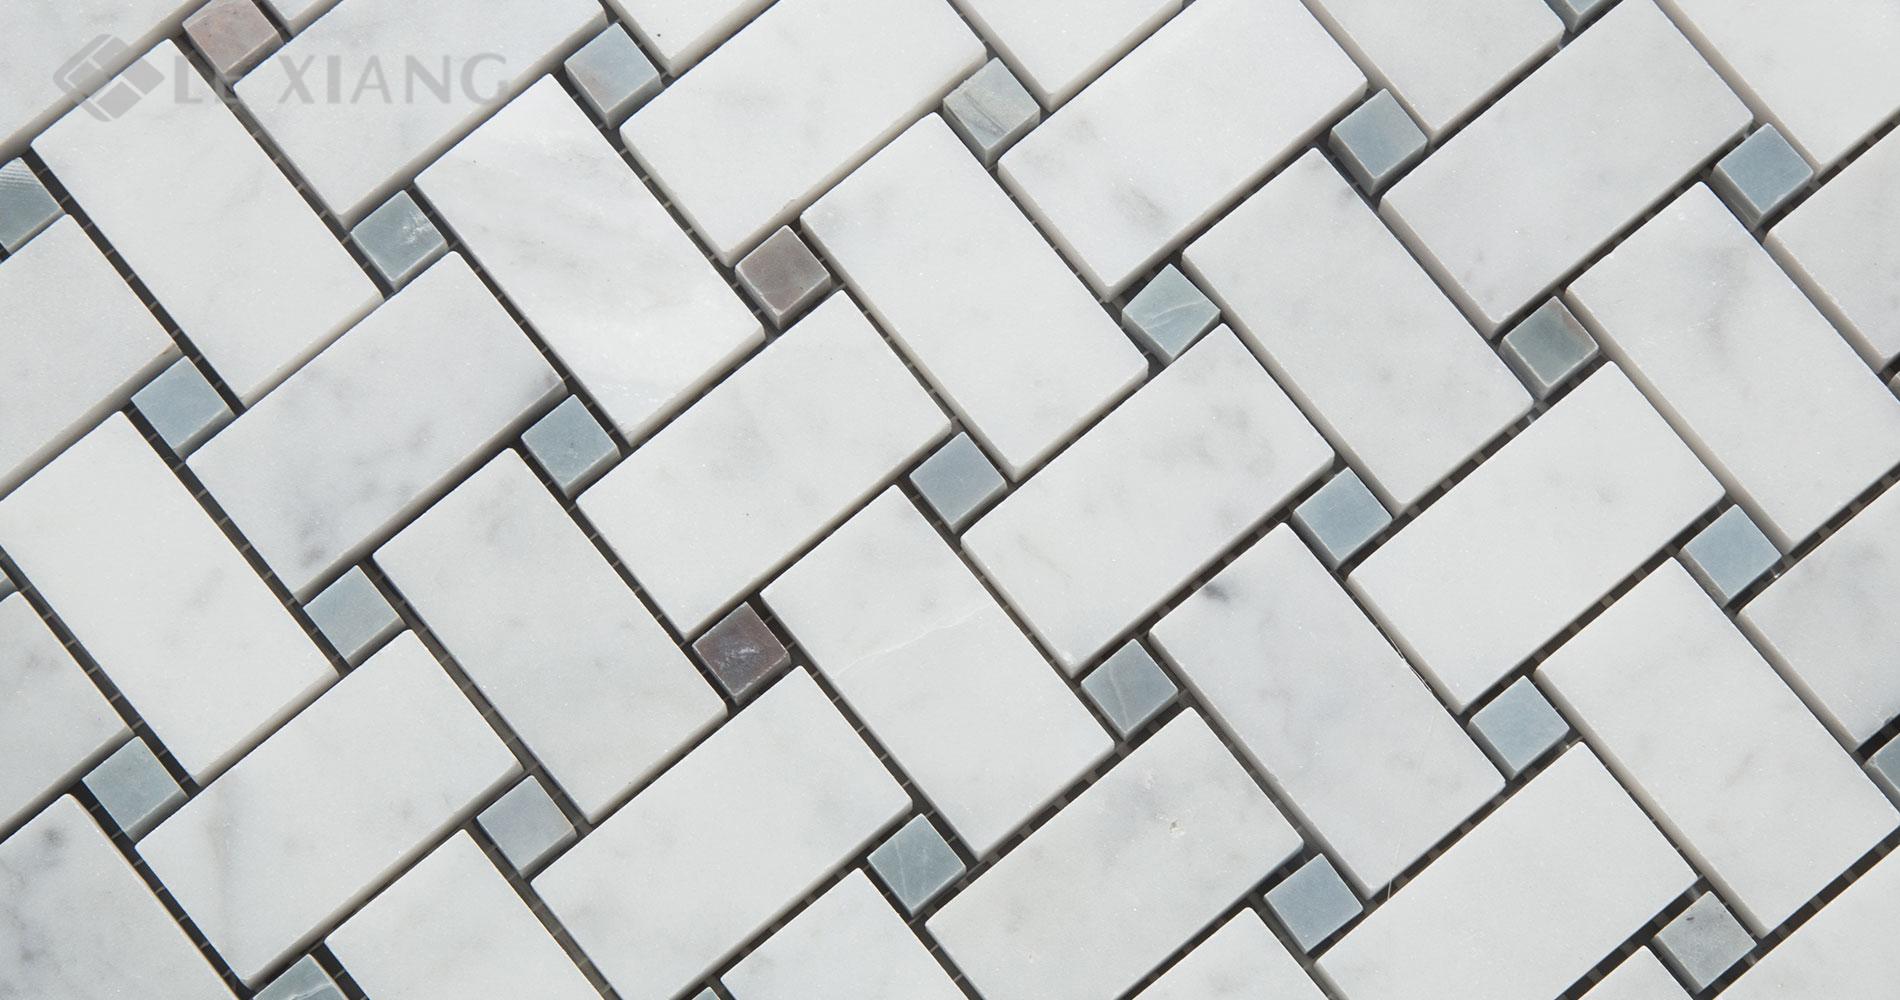 Carrara-Basketweave-Marble-Mosaic-Tile-For-Kitchen-Backsplash-5